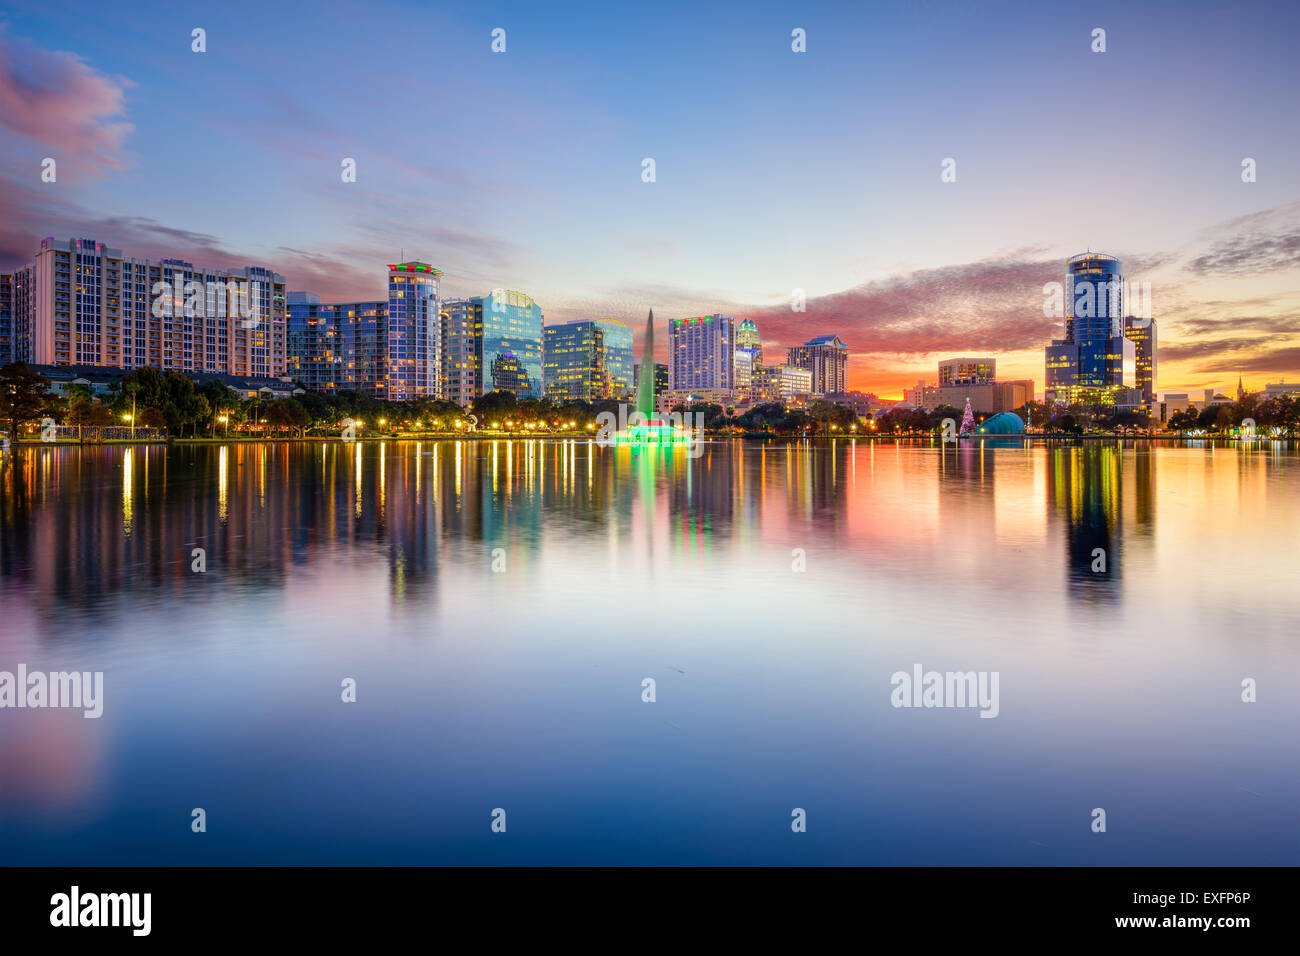 Orlando, Florida, USA downtown city skyline on Eola Lake. - Stock Image